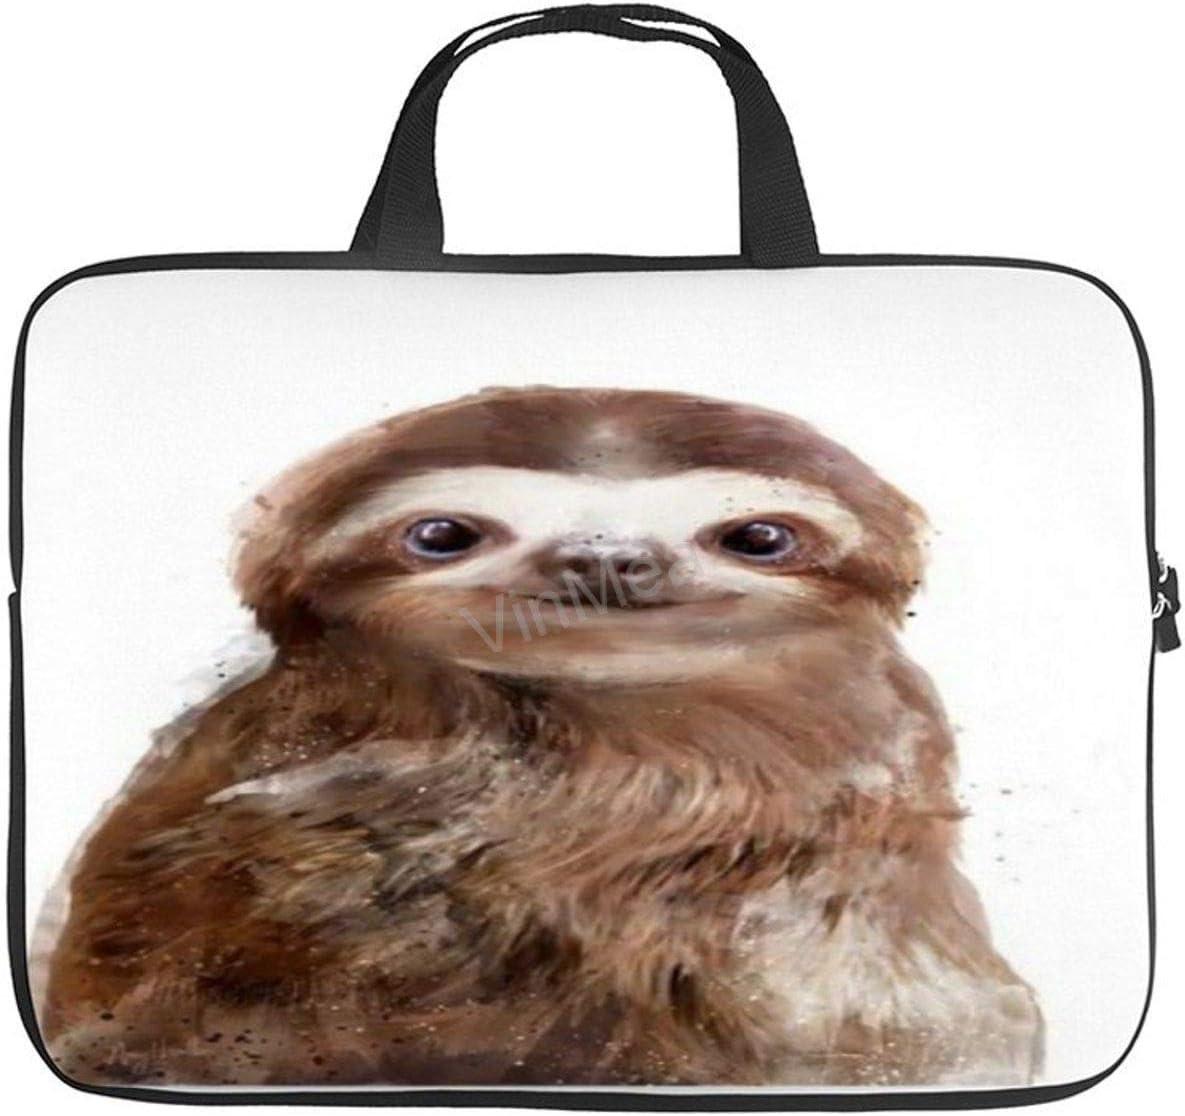 Laptop Shoulder Bag, Funny Poster Pictures Little-Sloth-Amy-Hamilton Waterproof Laptop Bag Computer Bag for Men Women School Work 15 Inch